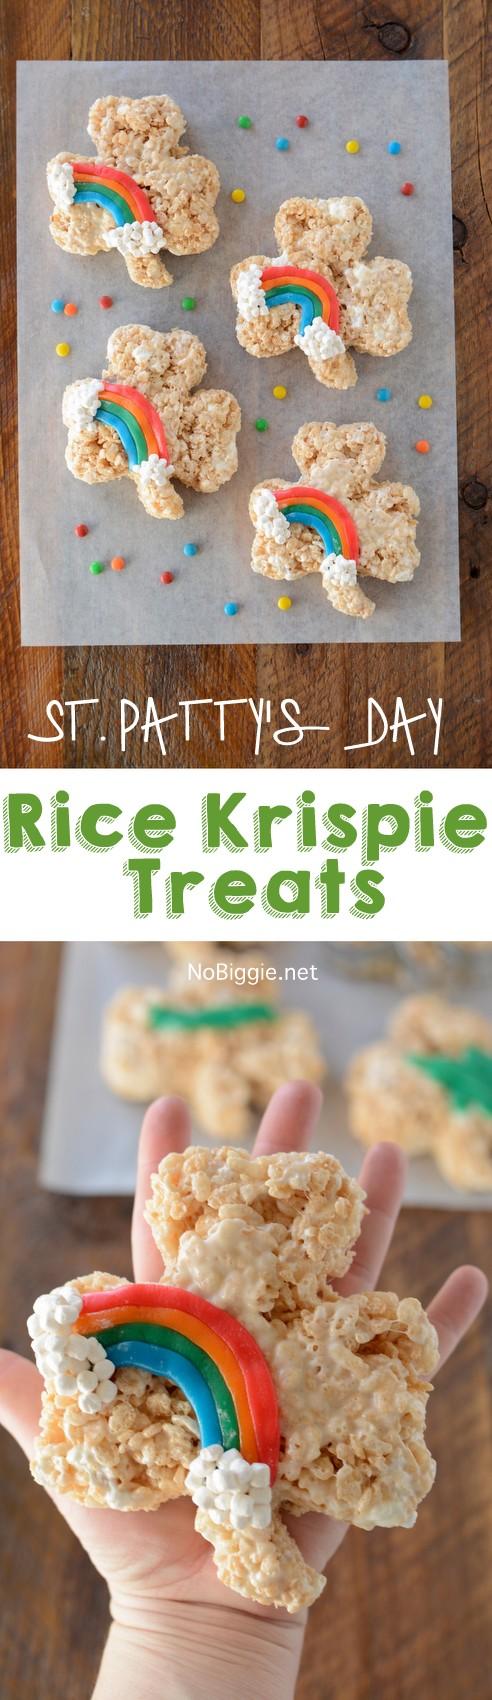 St. Patrick's Day Rice Krispie Treats from No Biggie